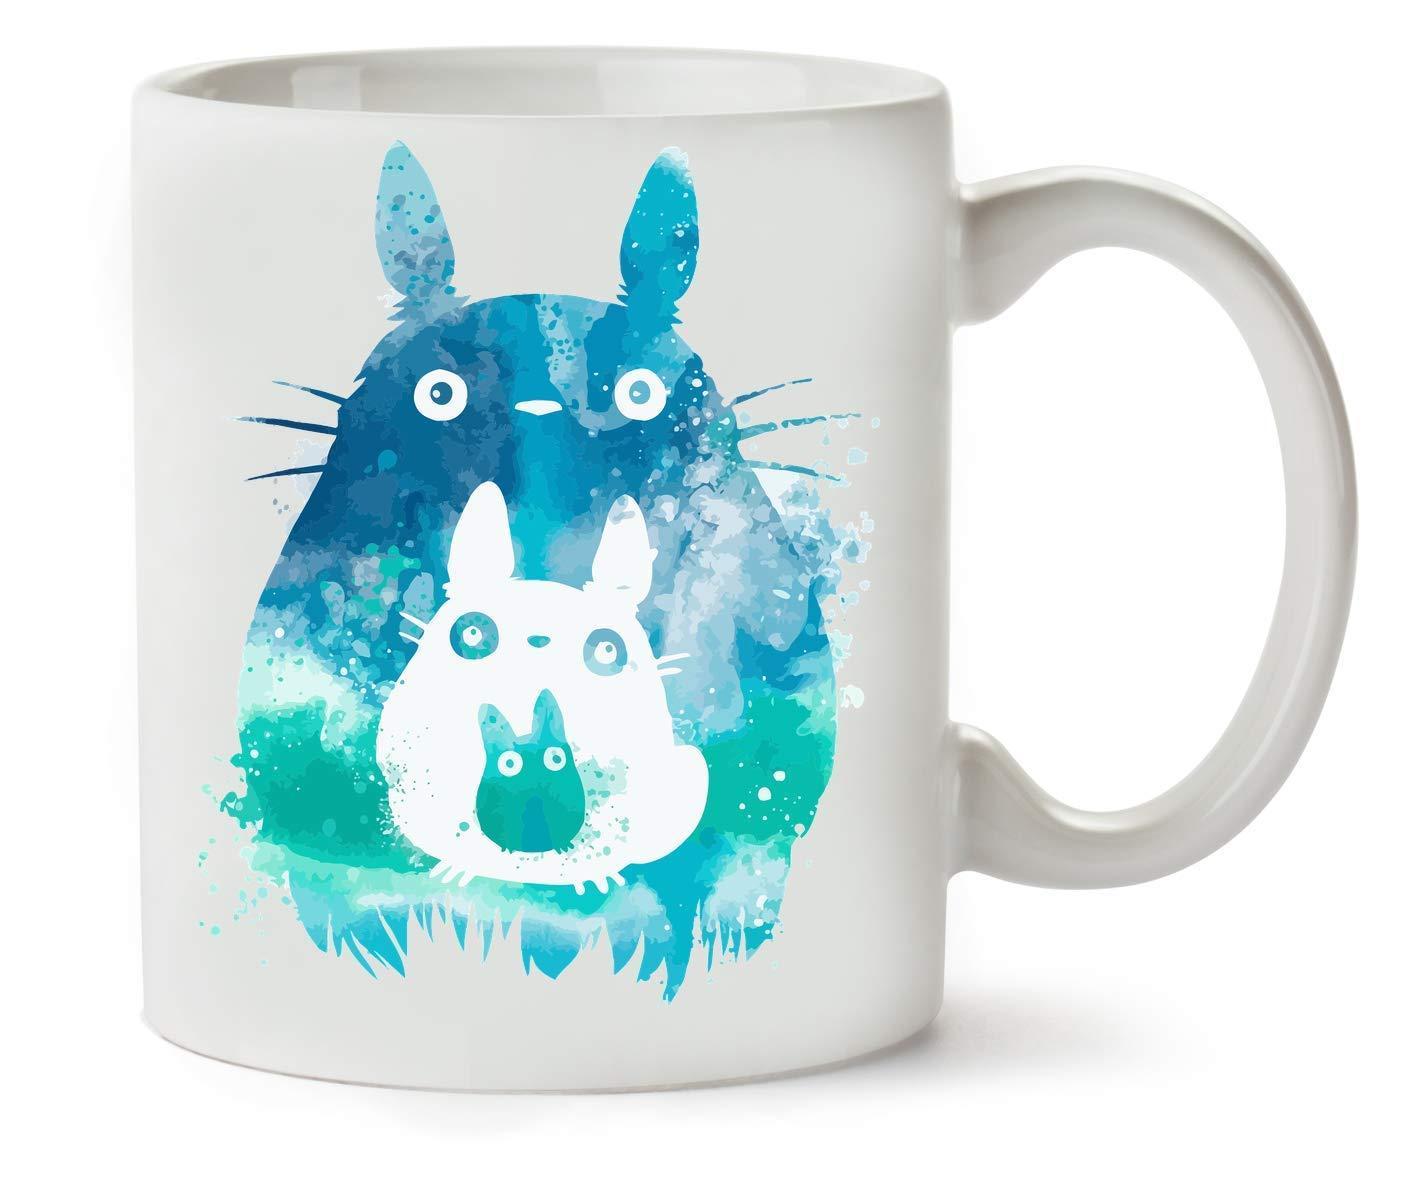 Classic My Spirits Coffee Tea Neighbor Totoro Forest Mug uTJKlF1c3